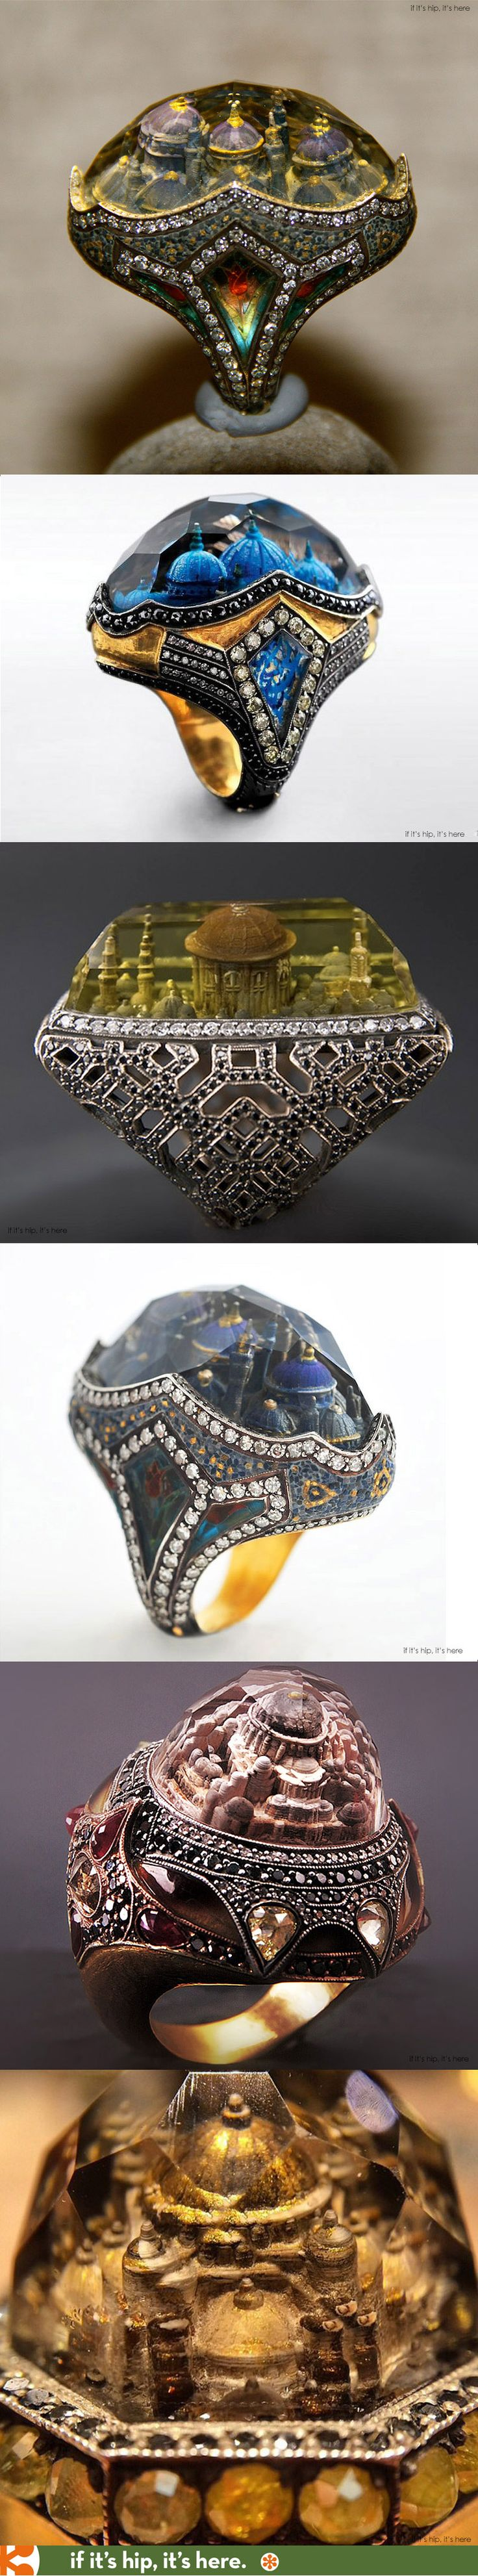 ~Incredible Istanbul Mosque Rings By Turkish Jeweler Sevan Biçakçi | House of Beccaria